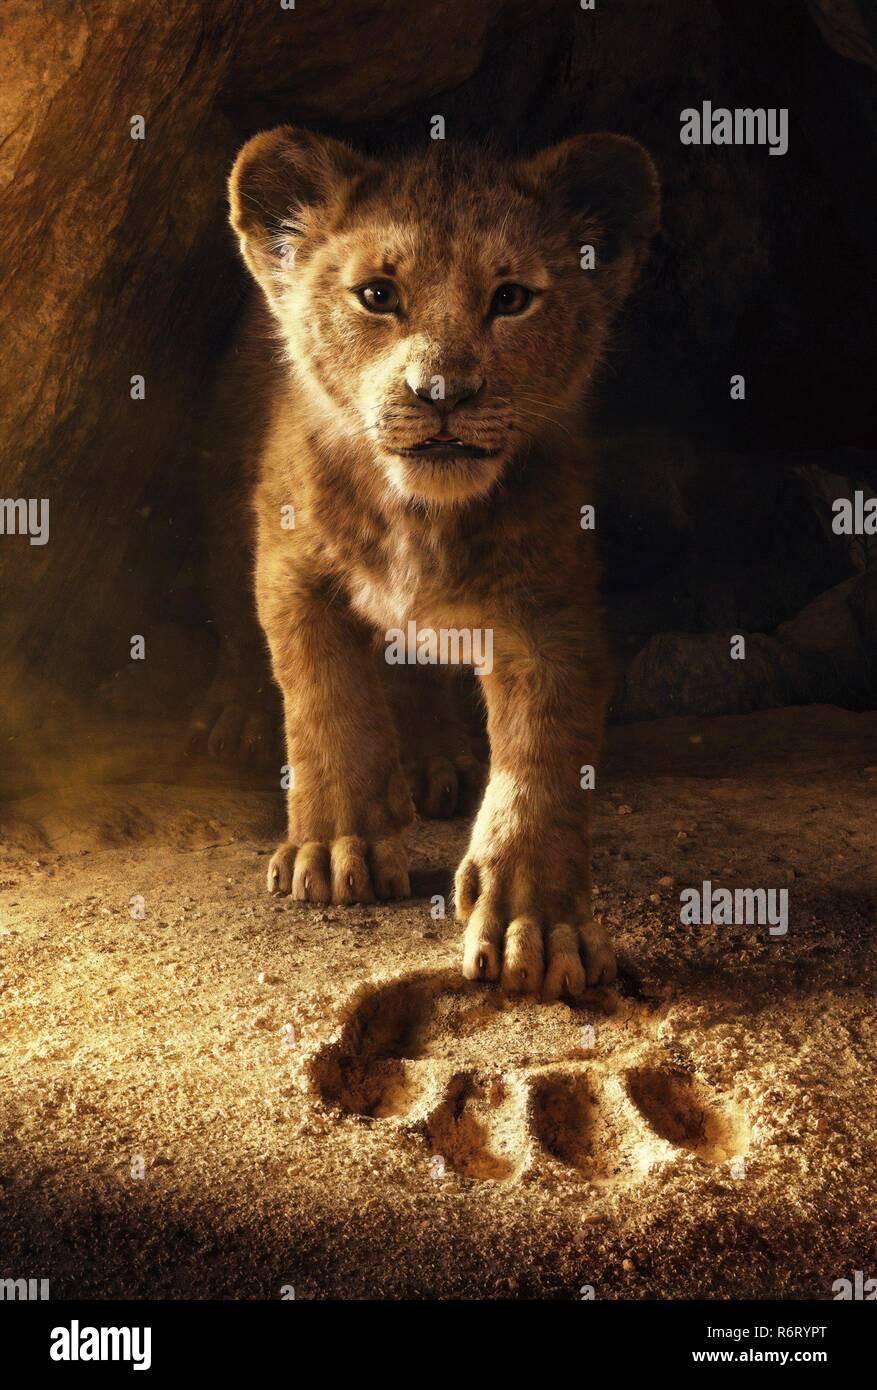 Original Film Title The Lion King English Title The Lion